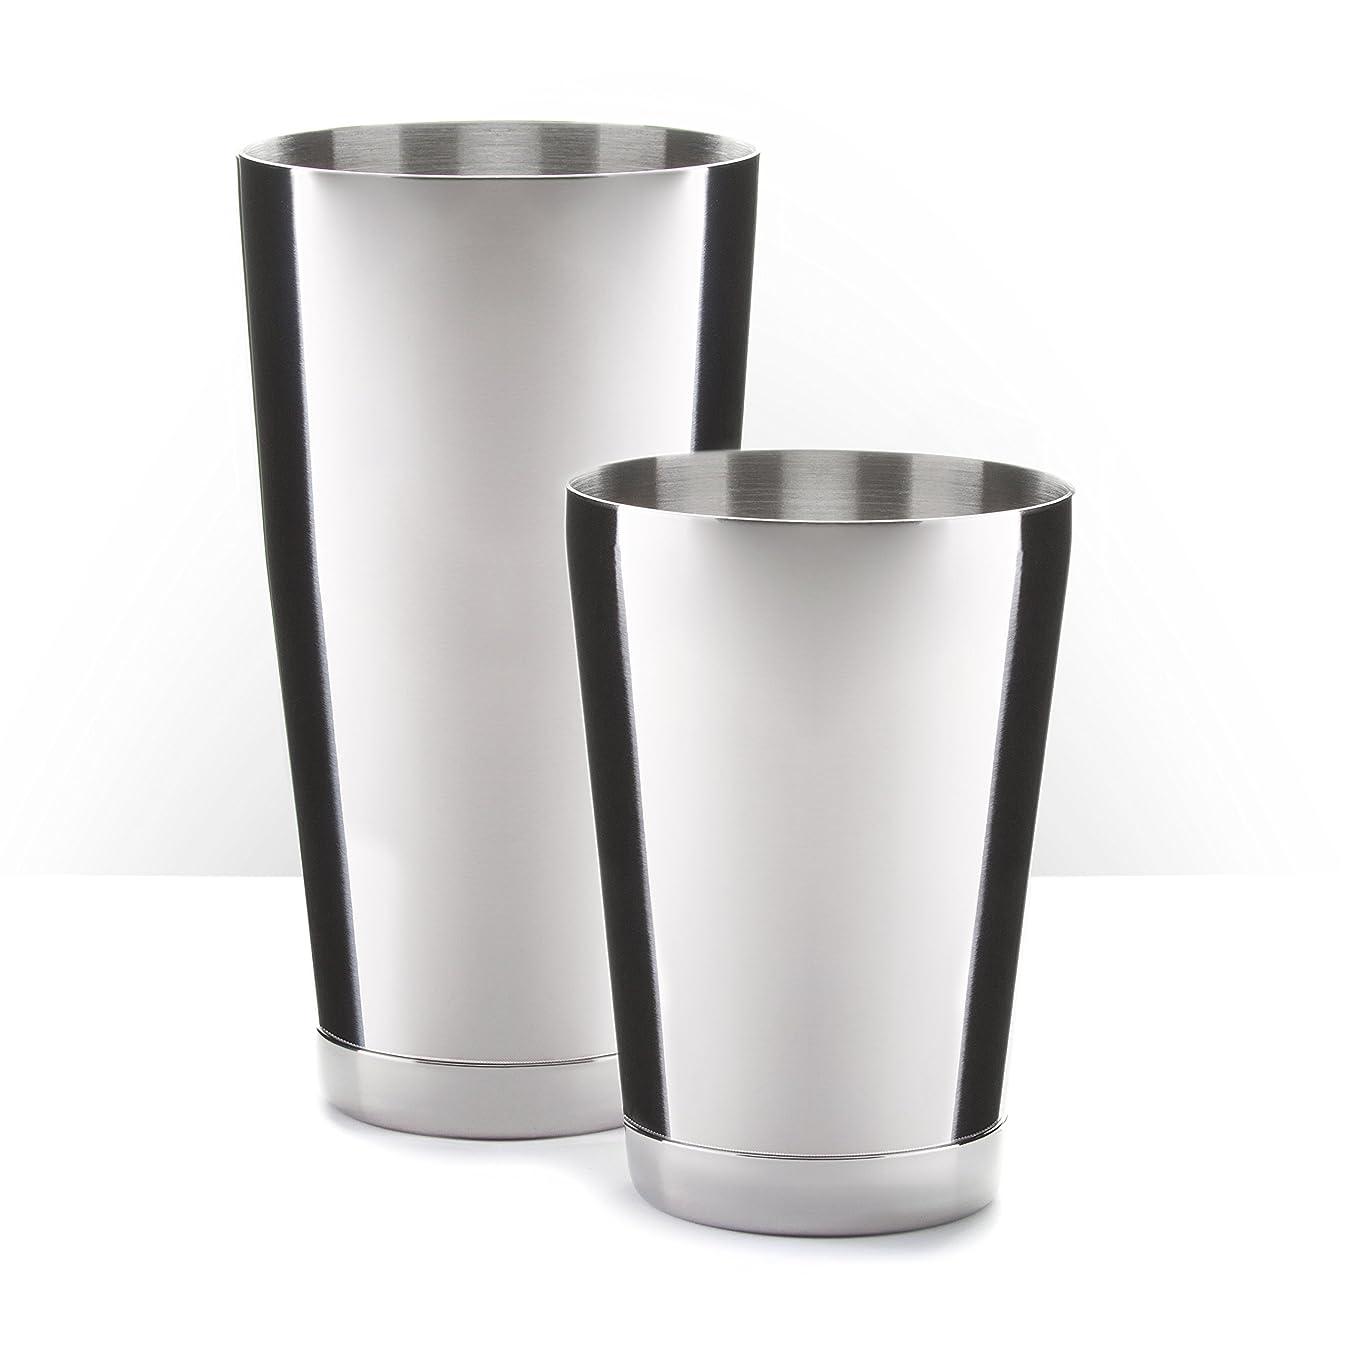 Pi?a Barware Stainless Steel Commercial Bar Boston Shaker Tin Set - 28oz. & 18oz.